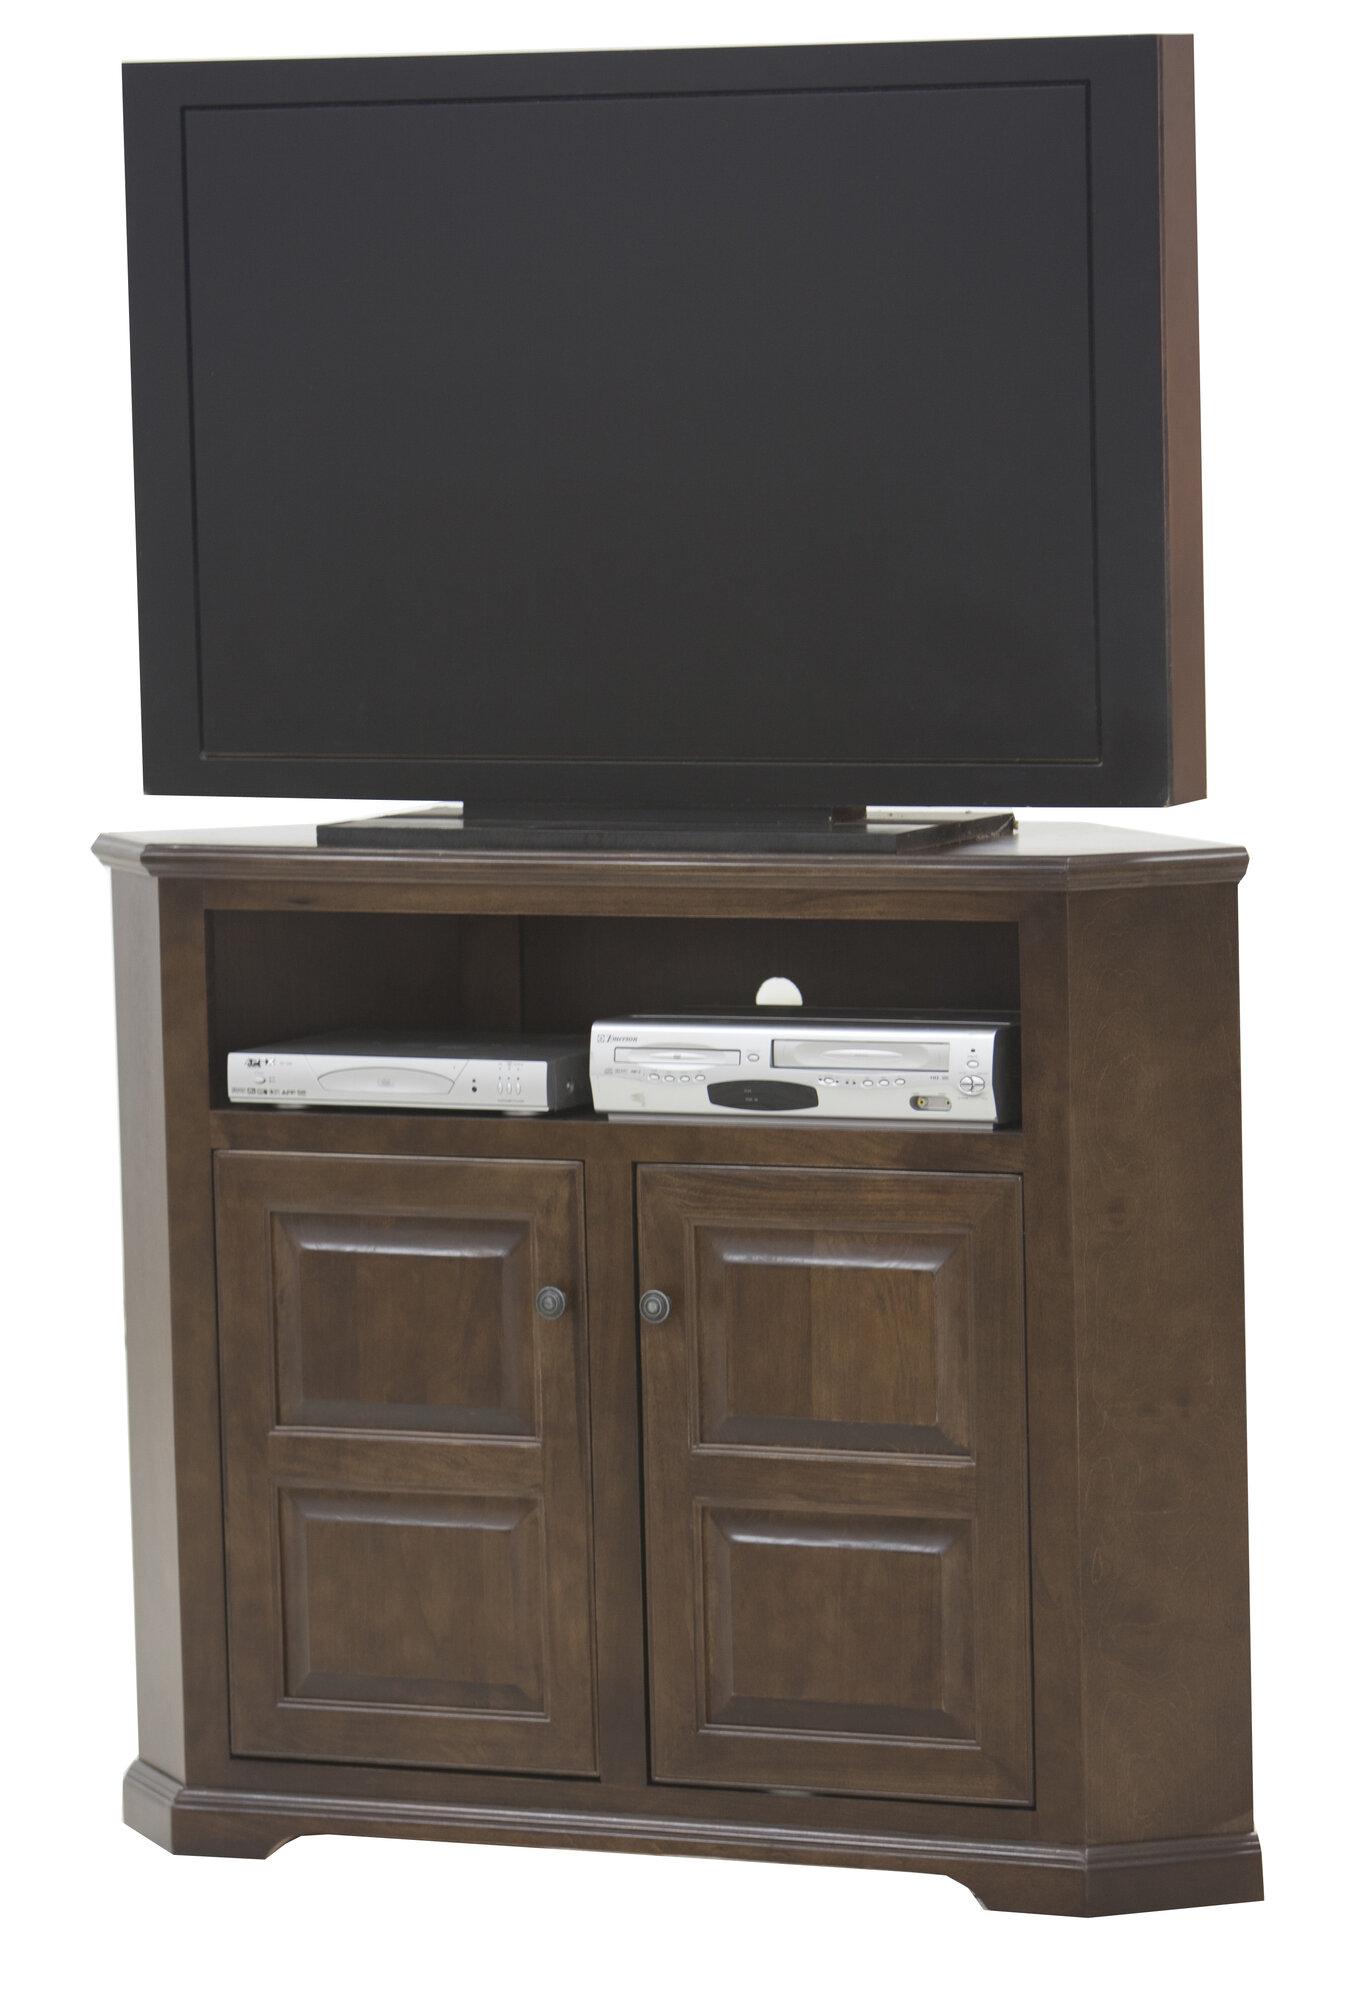 Eagle Furniture Manufacturing Savannah TV Stand Finish: European Coffee, Door Type: Plain Glass